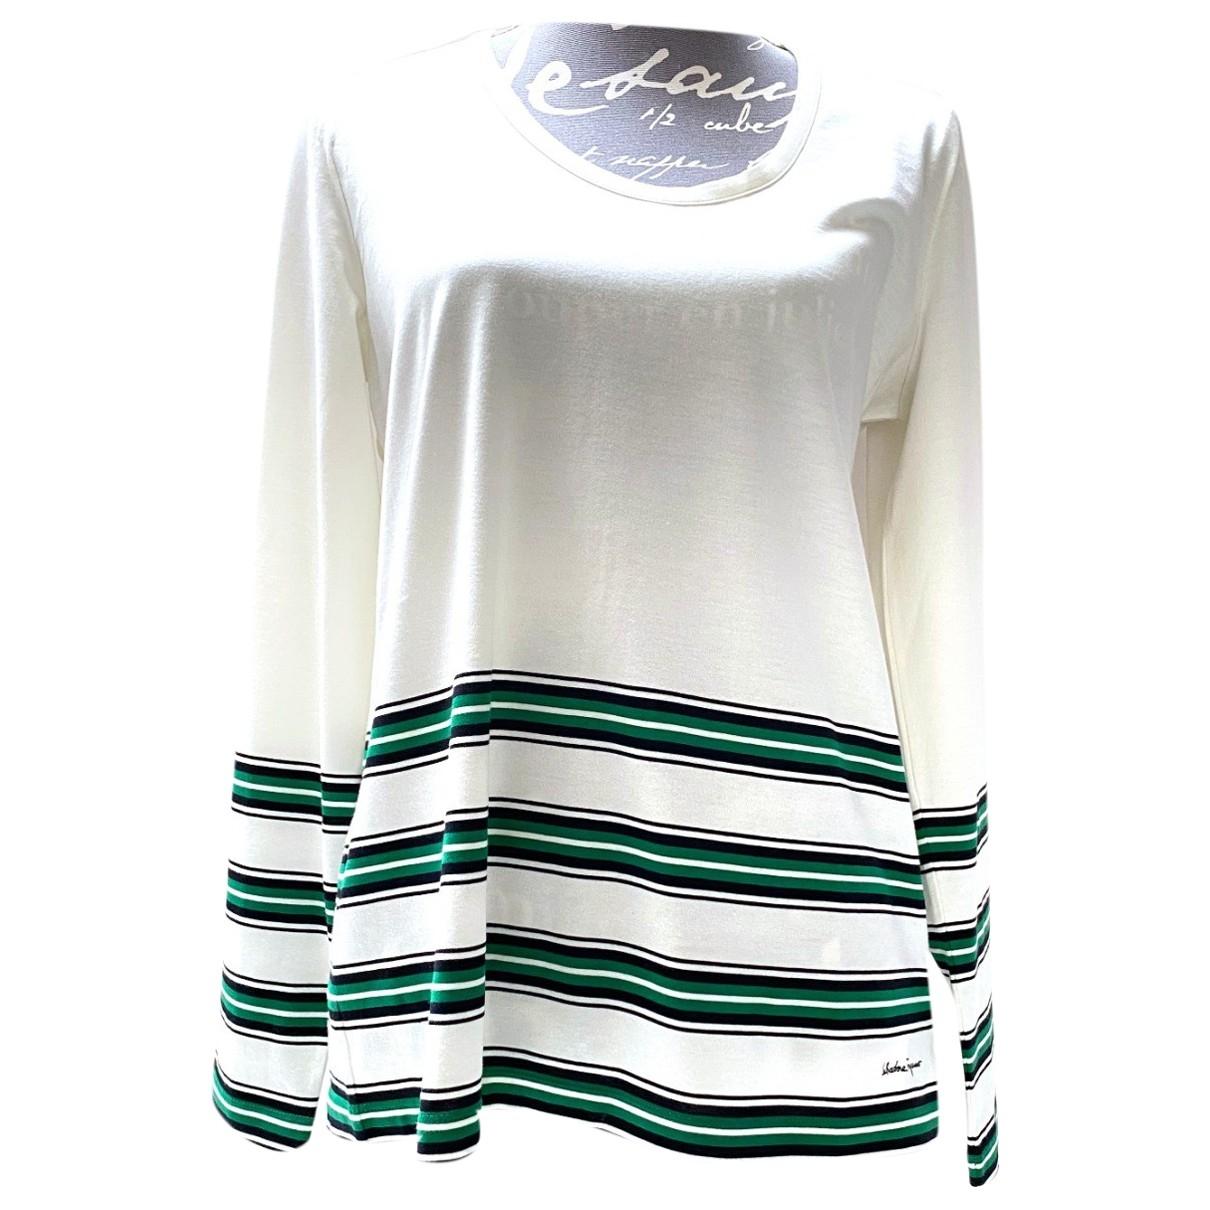 Salvatore Ferragamo \N White Cotton  top for Women L International